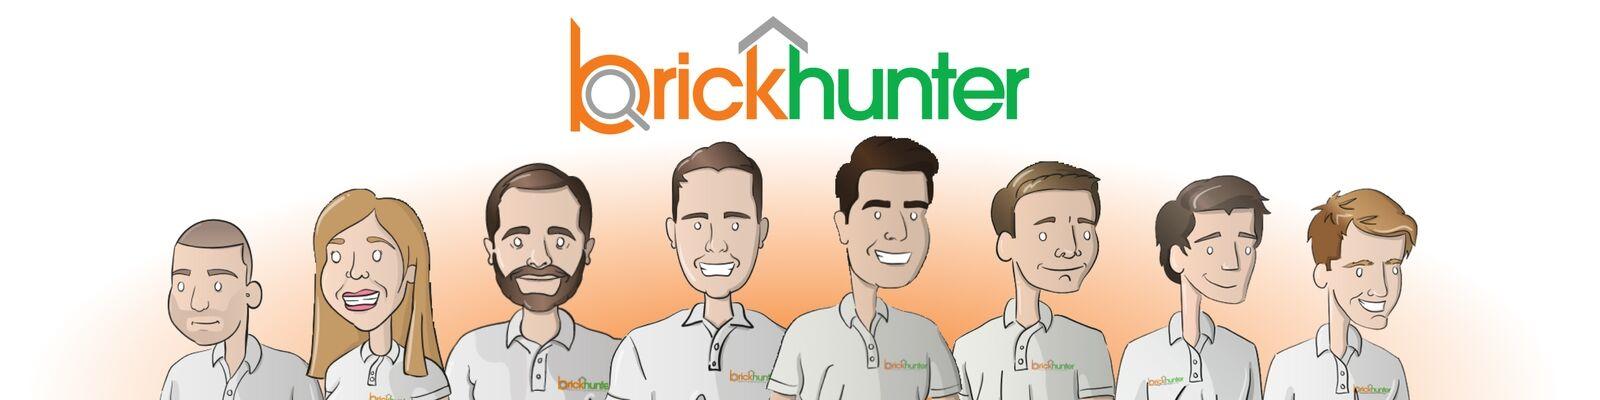 www.brickhunter.com